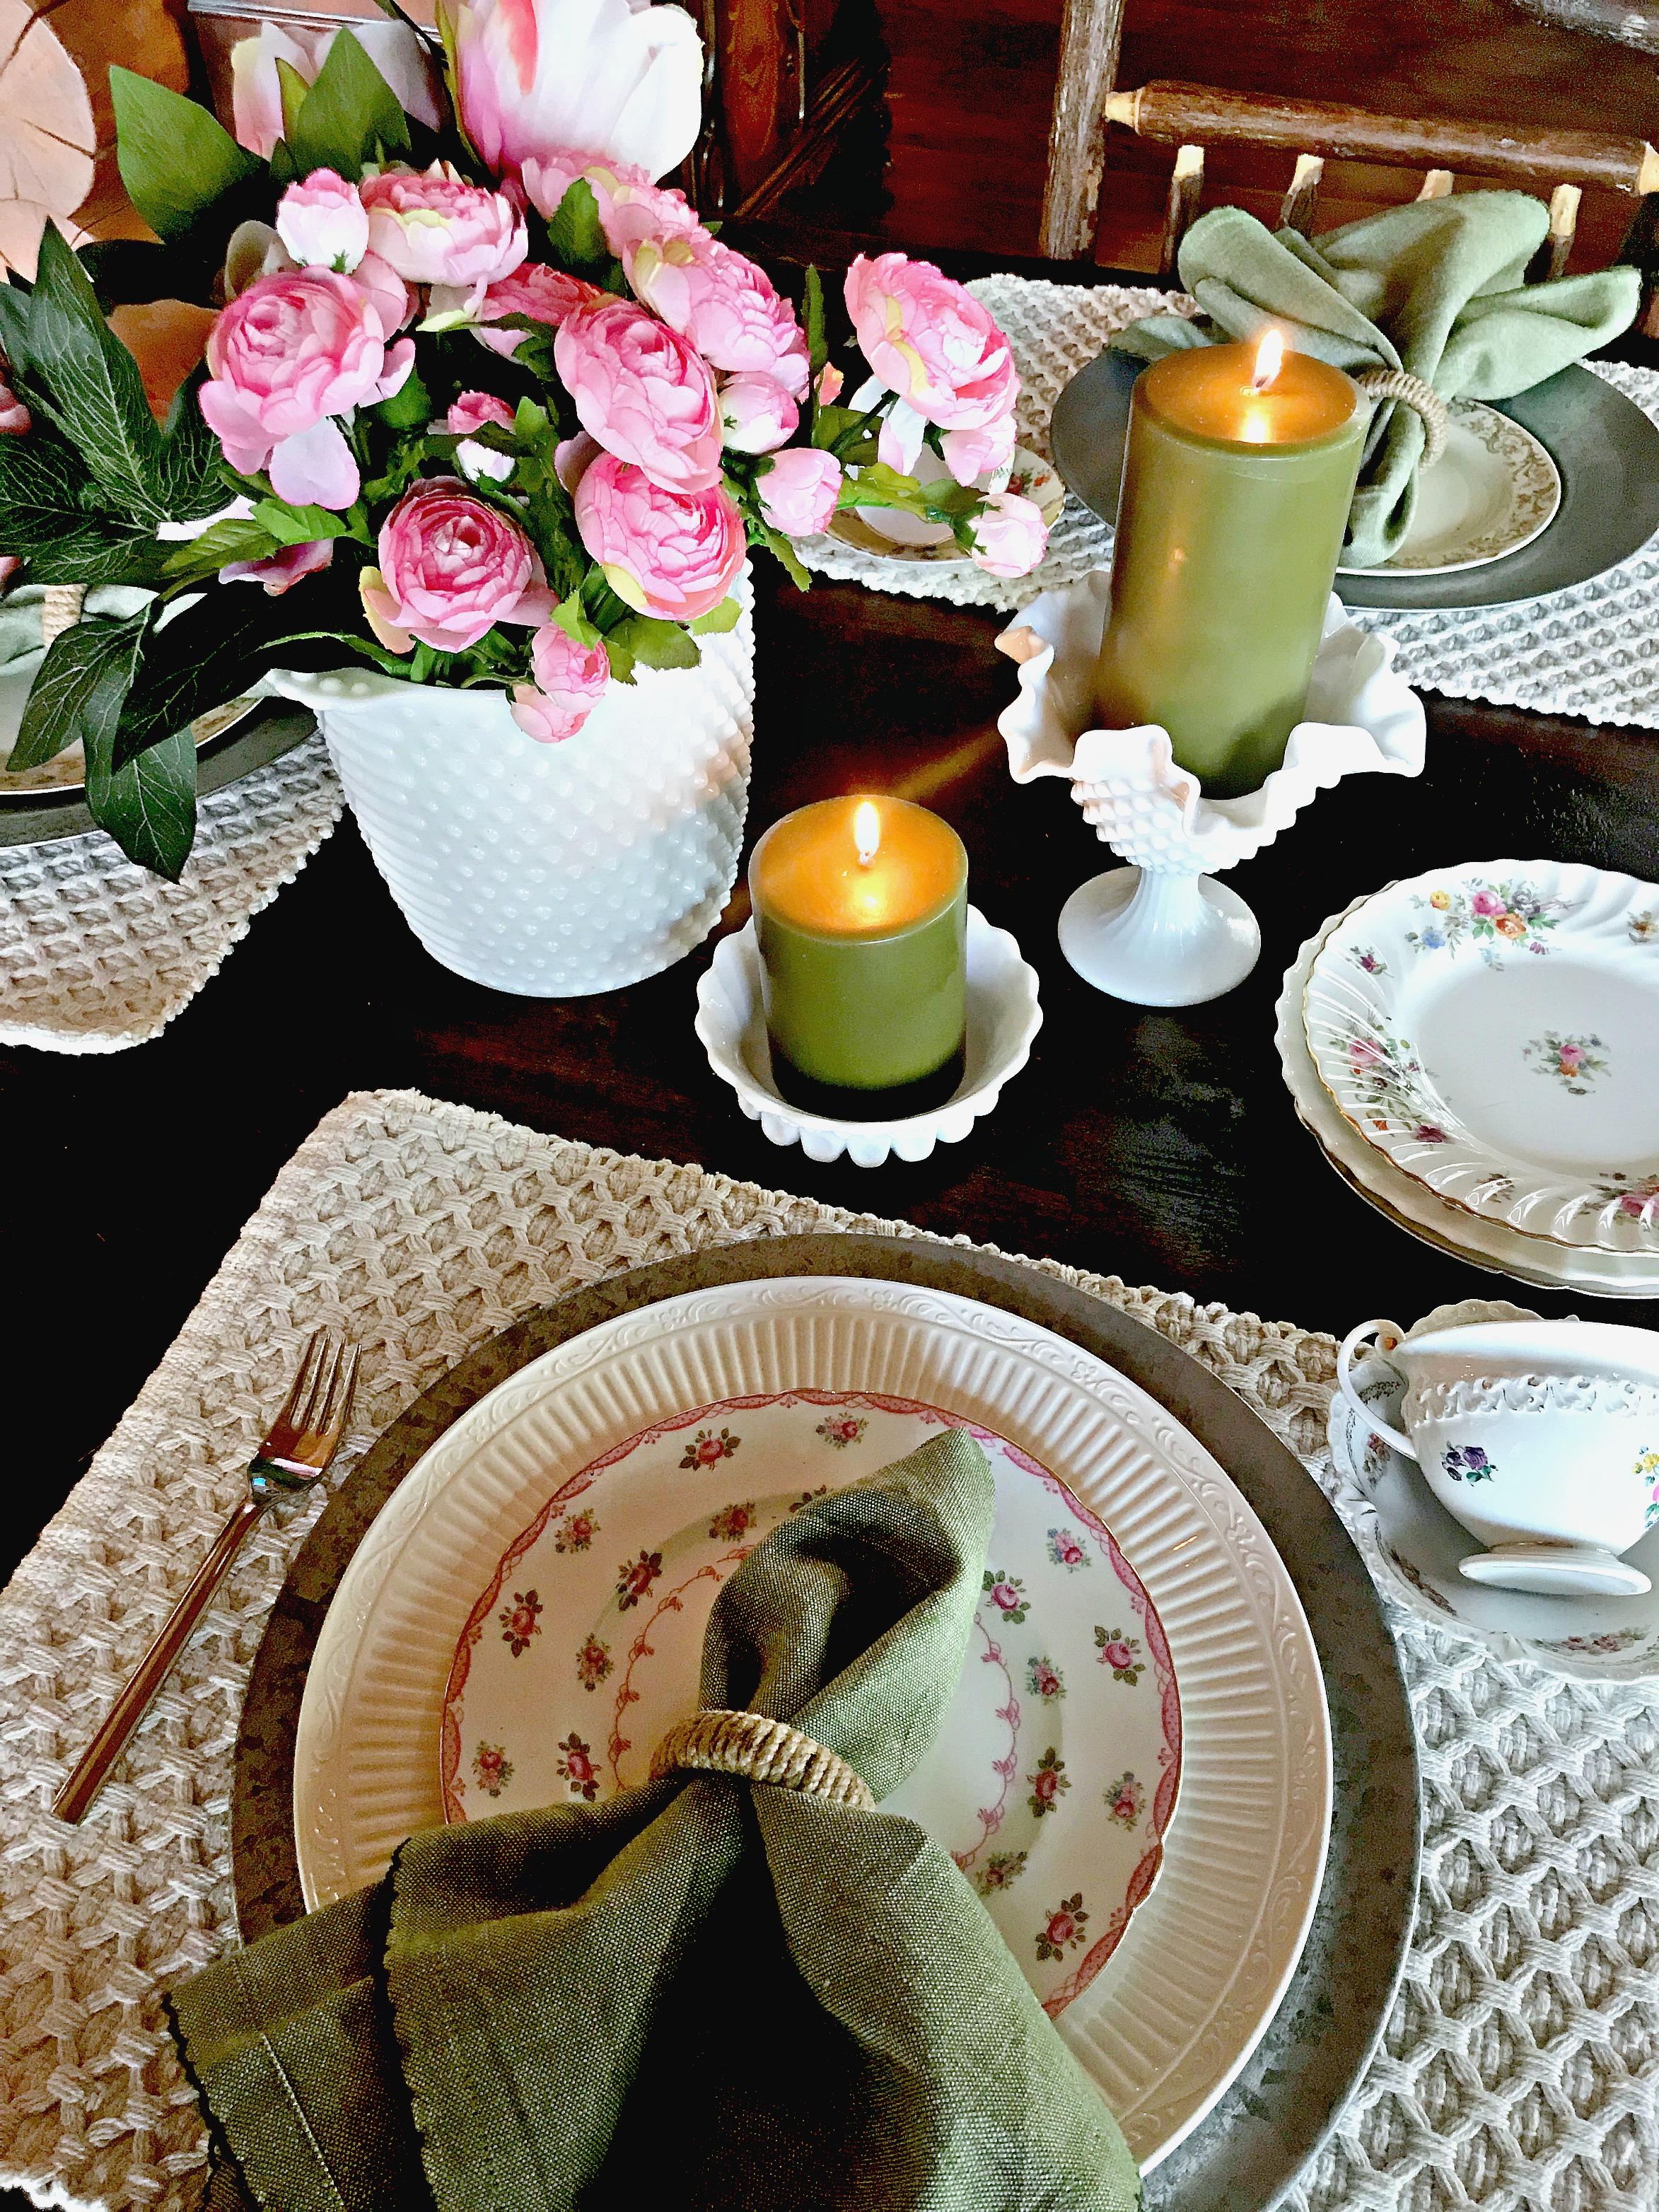 Spring Decor, Table Setting, Tea Cups, Vintage, Milk Class, Tea Cups, Candles